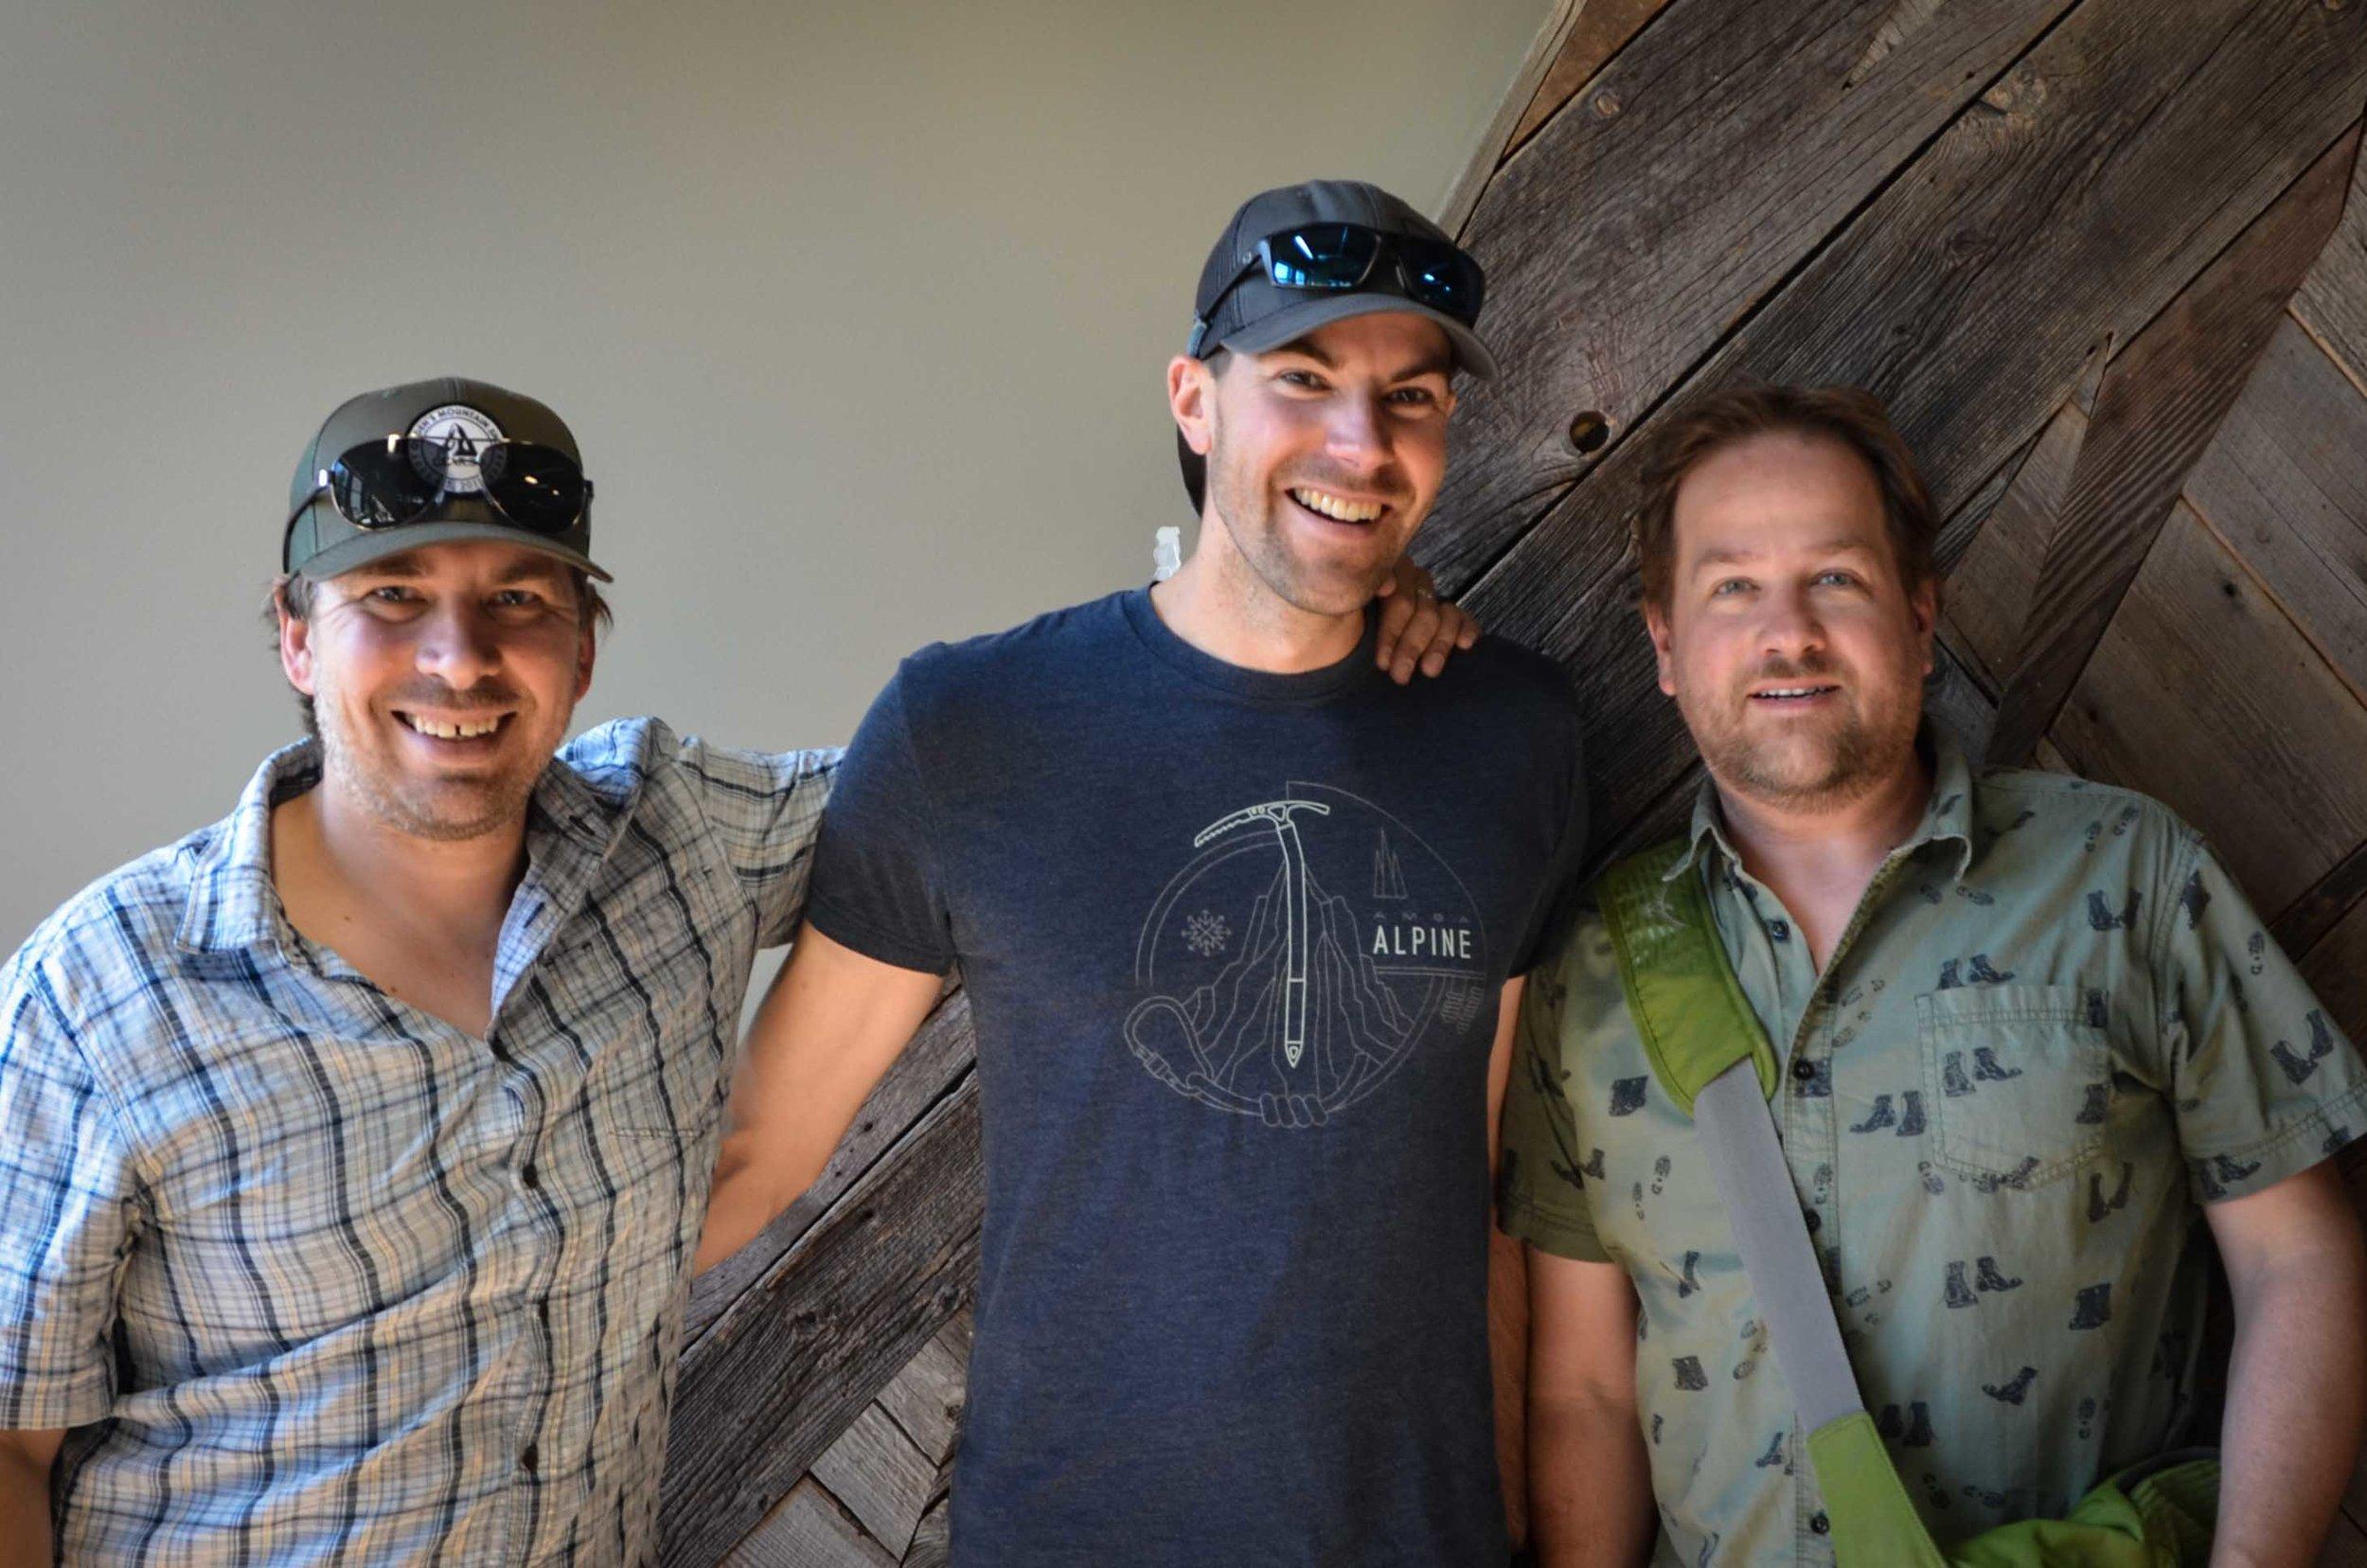 Left to right: R. Brandon Long, Derek DeBruin, Todd Oberndorfer